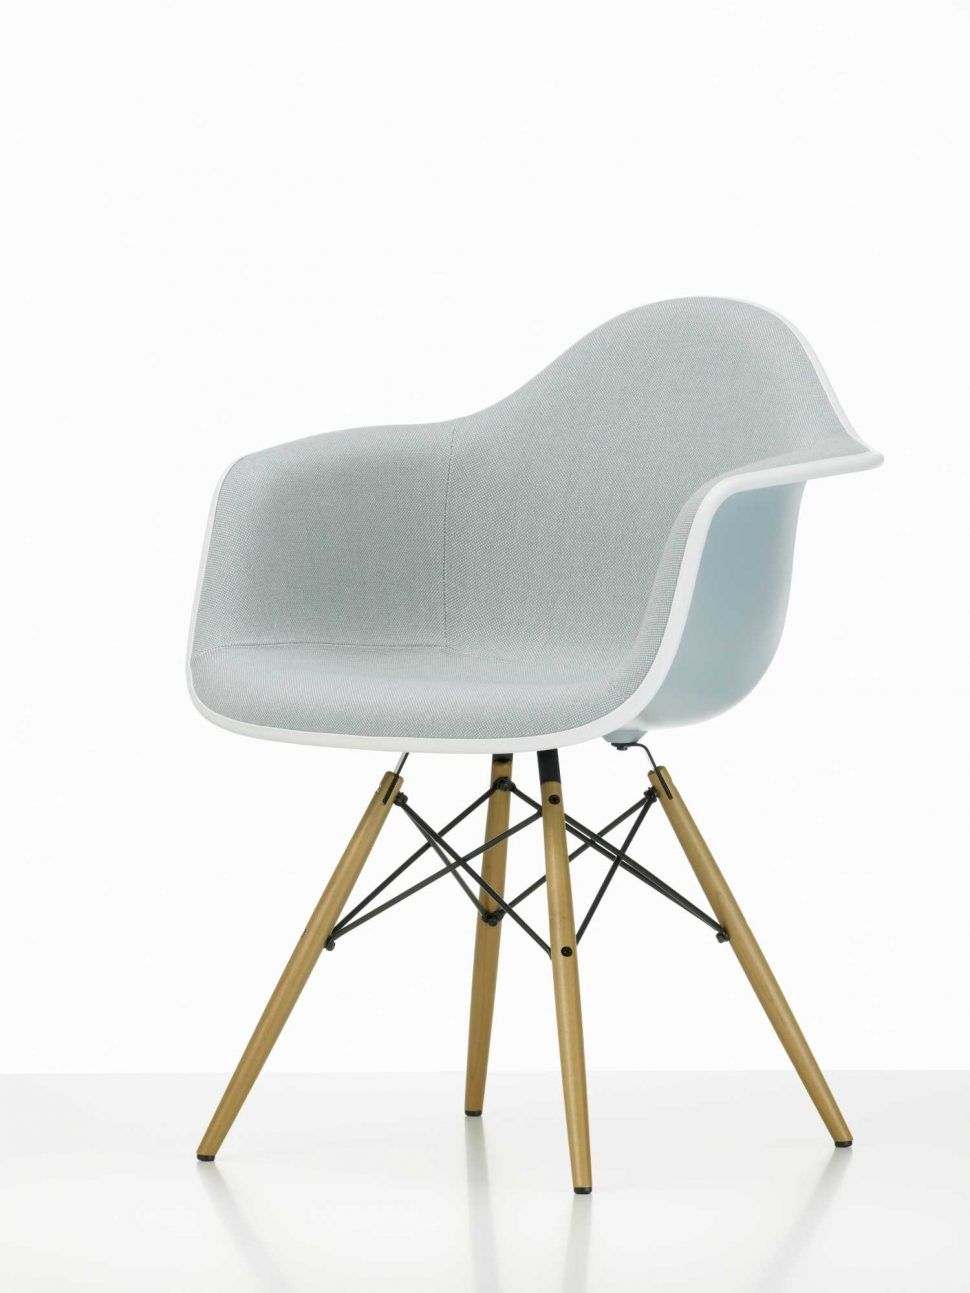 eames arm chair black folding armchair james dcw charles ottoman lounge recliner replica dsr base aluminum management